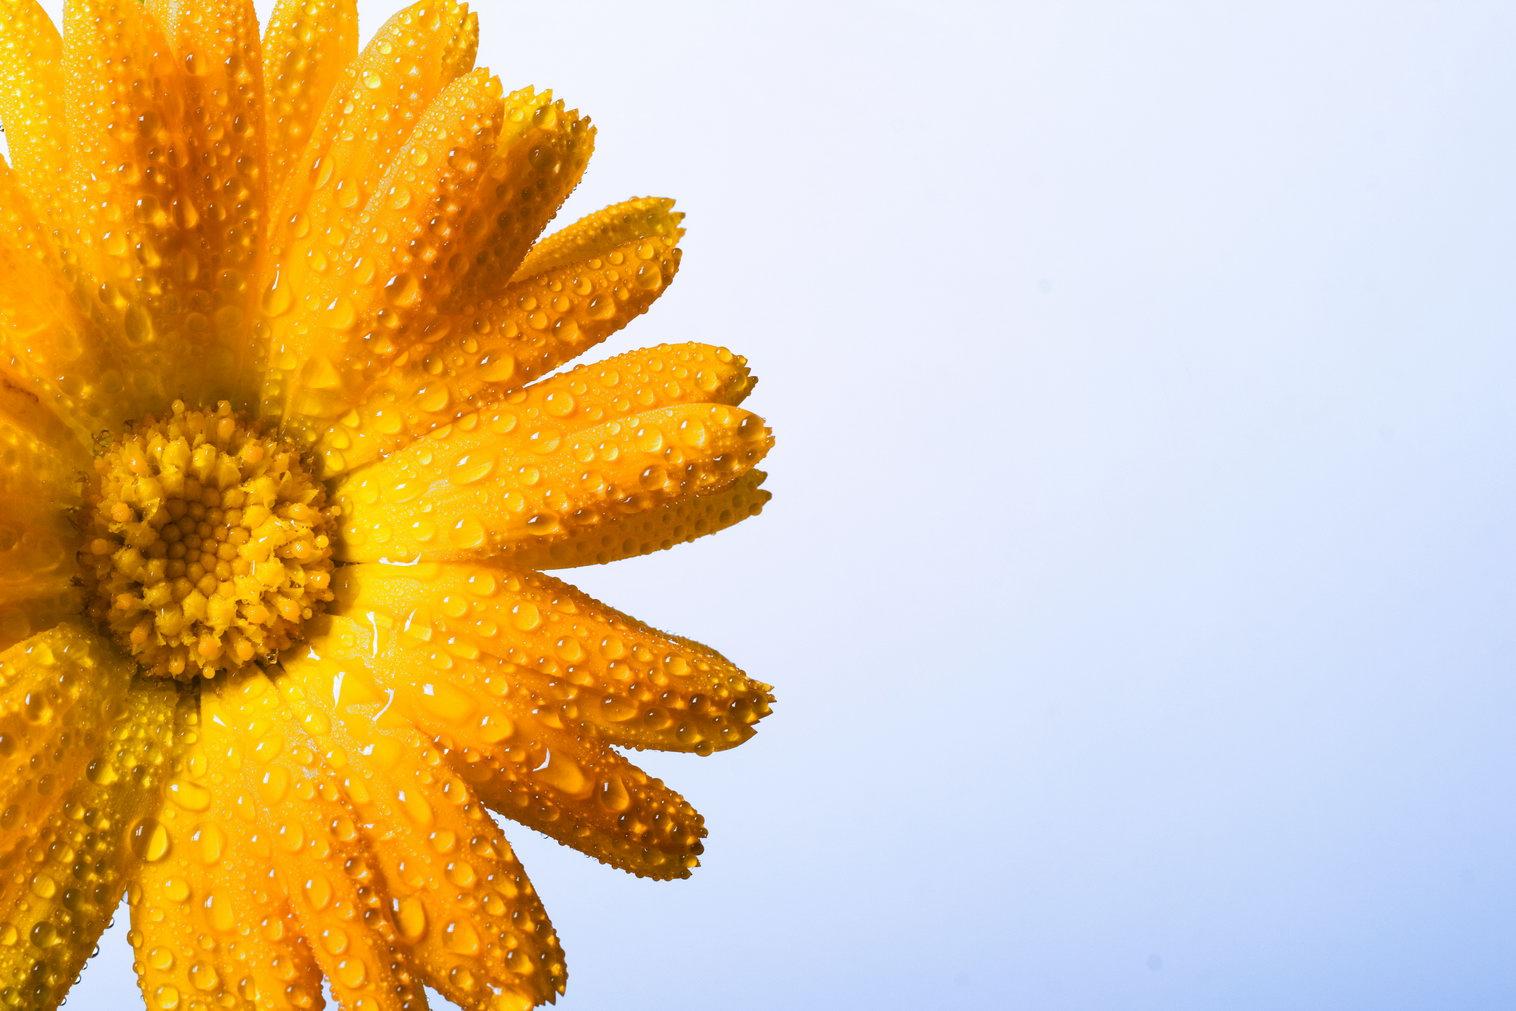 Wet yellow flower, Beautiful, Closeup, Flower, Nature, HQ Photo